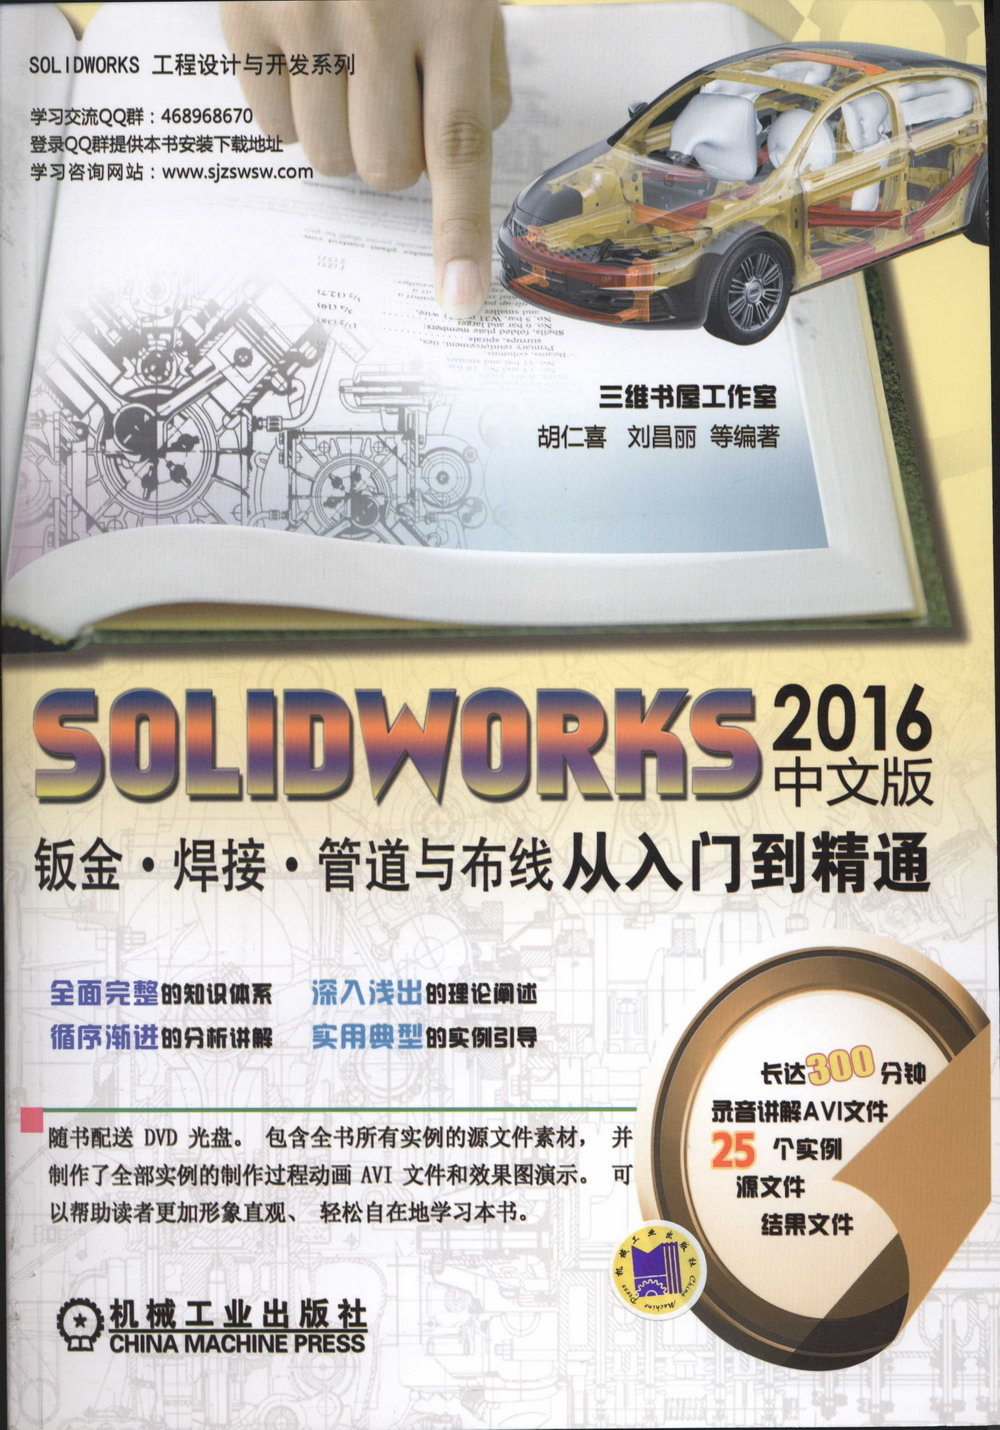 SOLIDWORKS 2016中文版鈑金·焊接·管道與布線從入門到精通